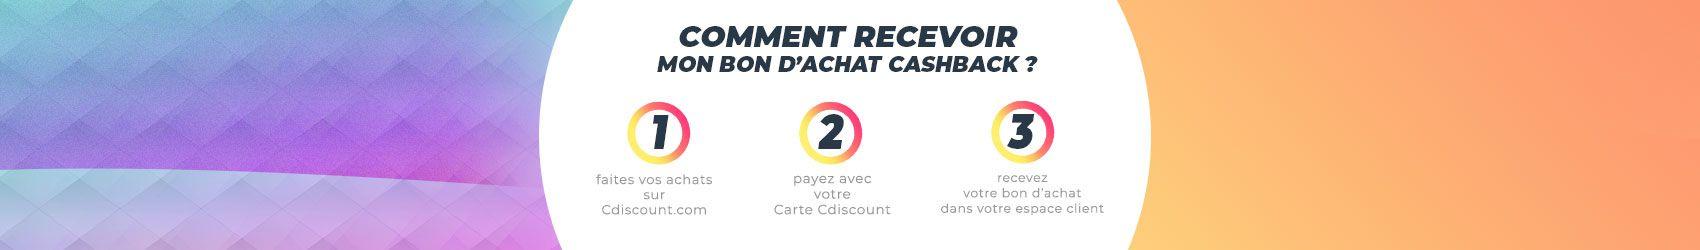 Carte Cdiscount Ficp.Cashback Carte Cdiscount Cumulez Des Euros